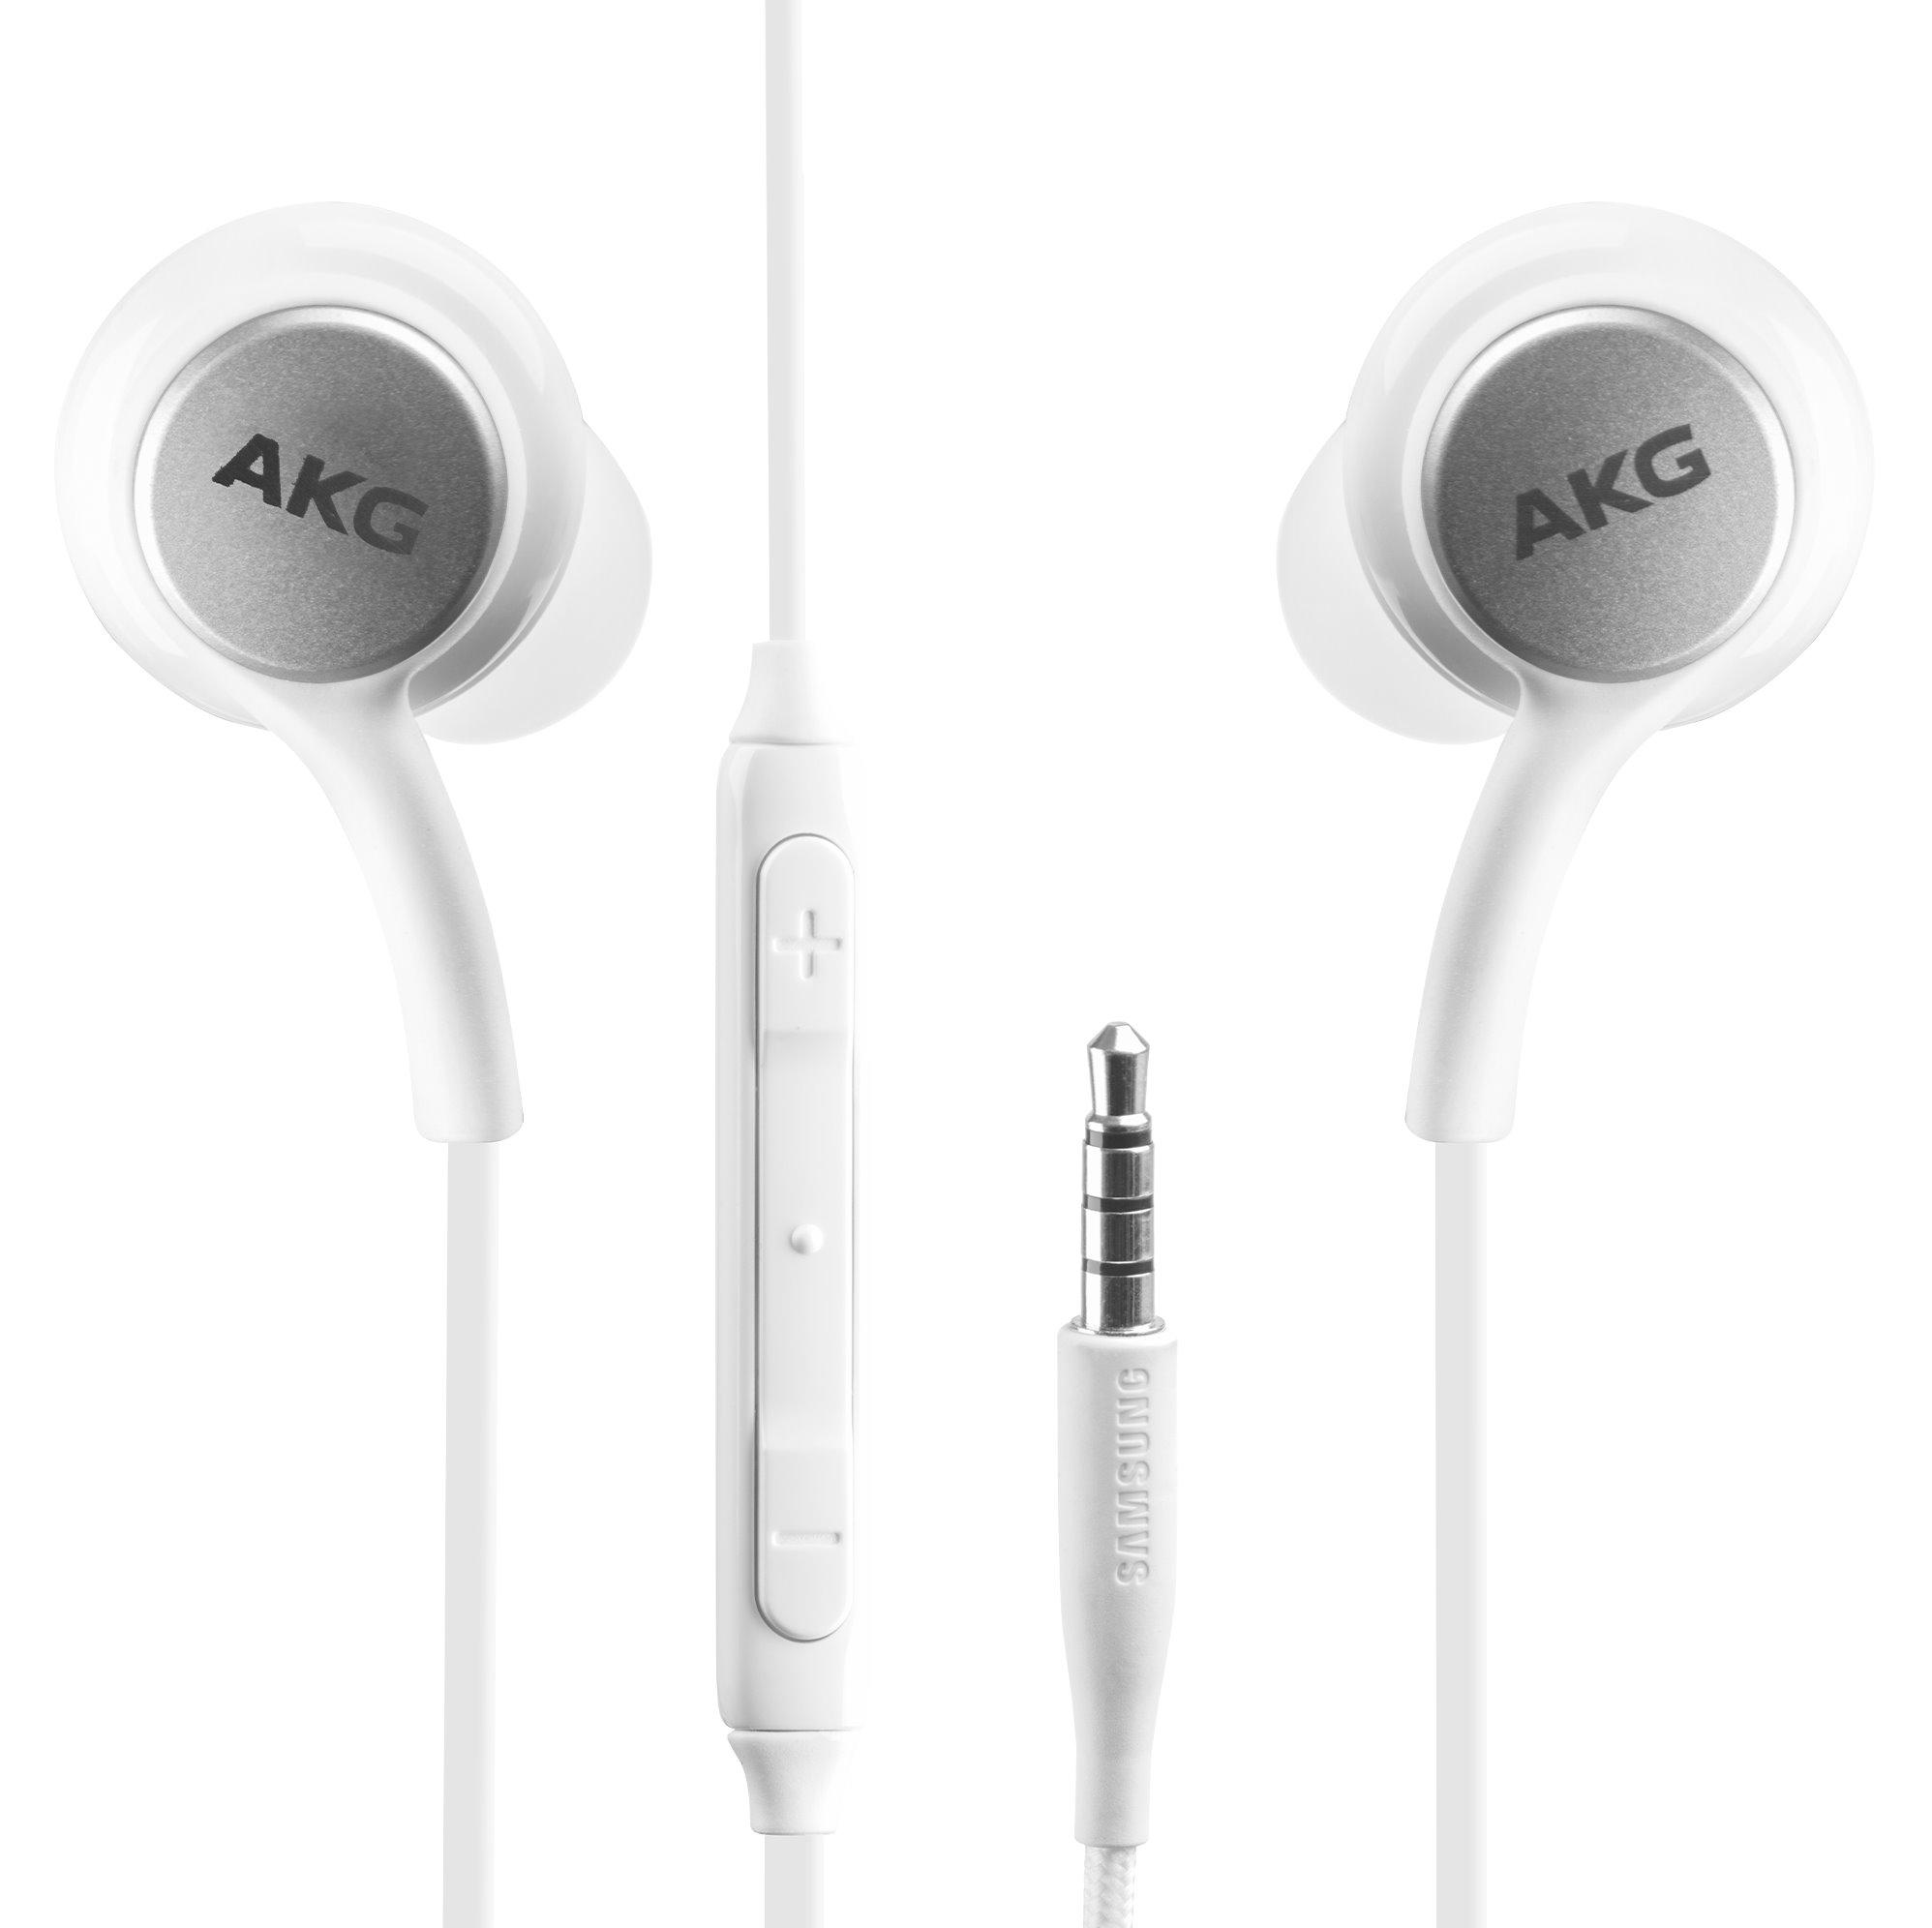 EO-IG955BWE Samsung Stereo HF AKG 3,5mm vč. ovládání White (Bulk)